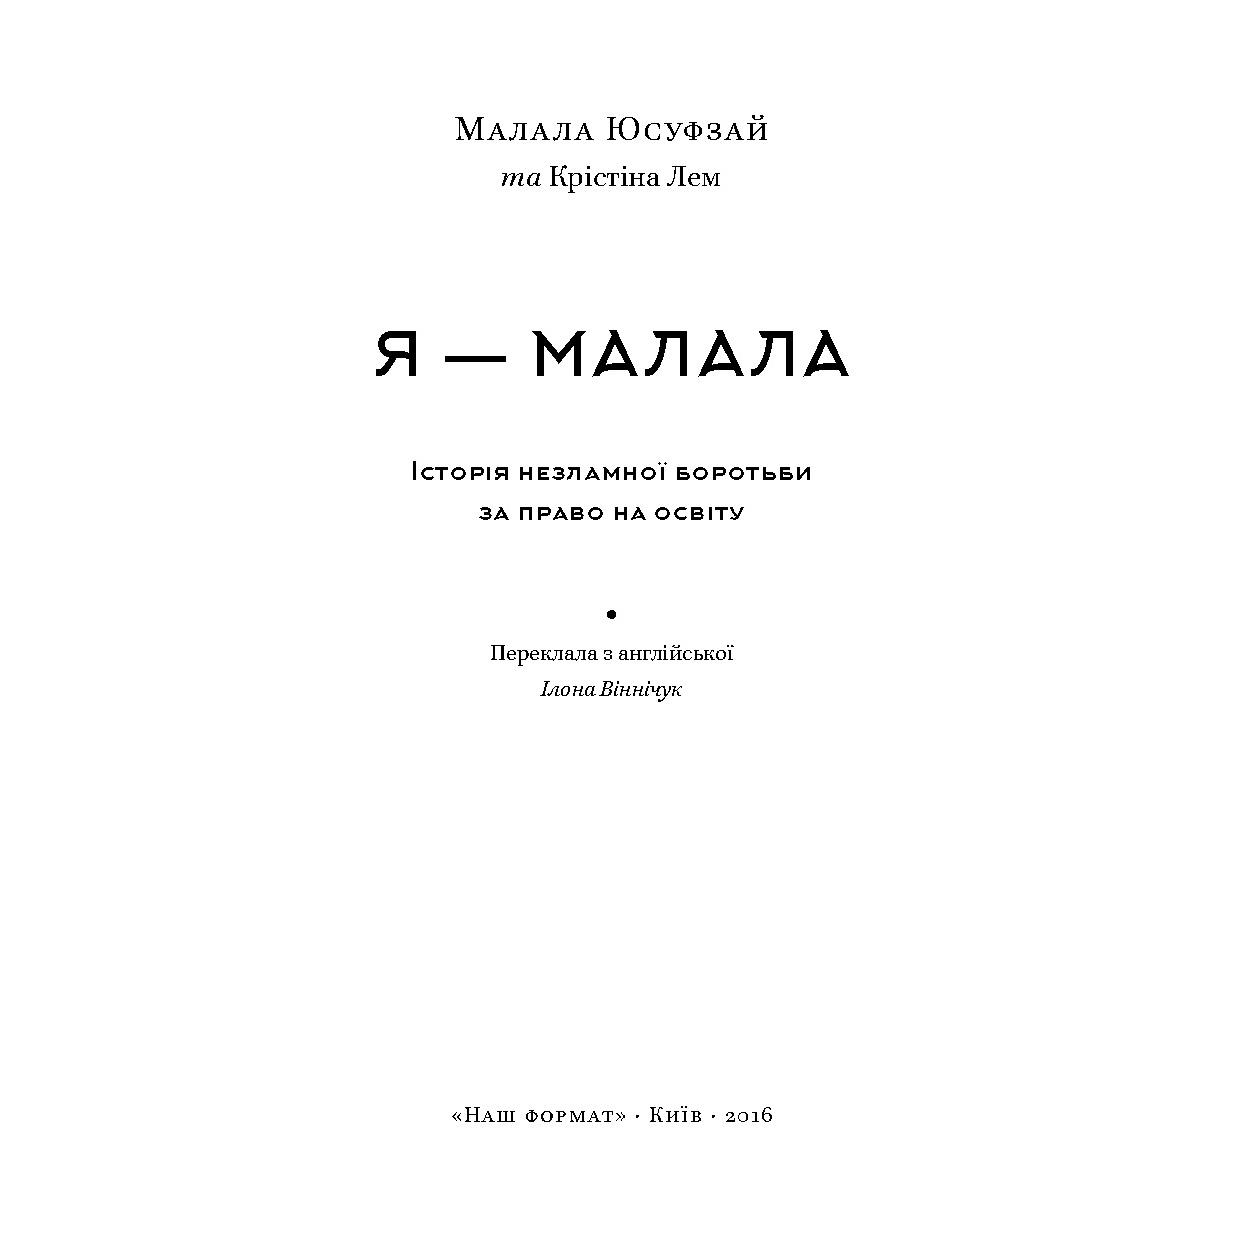 065_yousafzai-malala_malala01